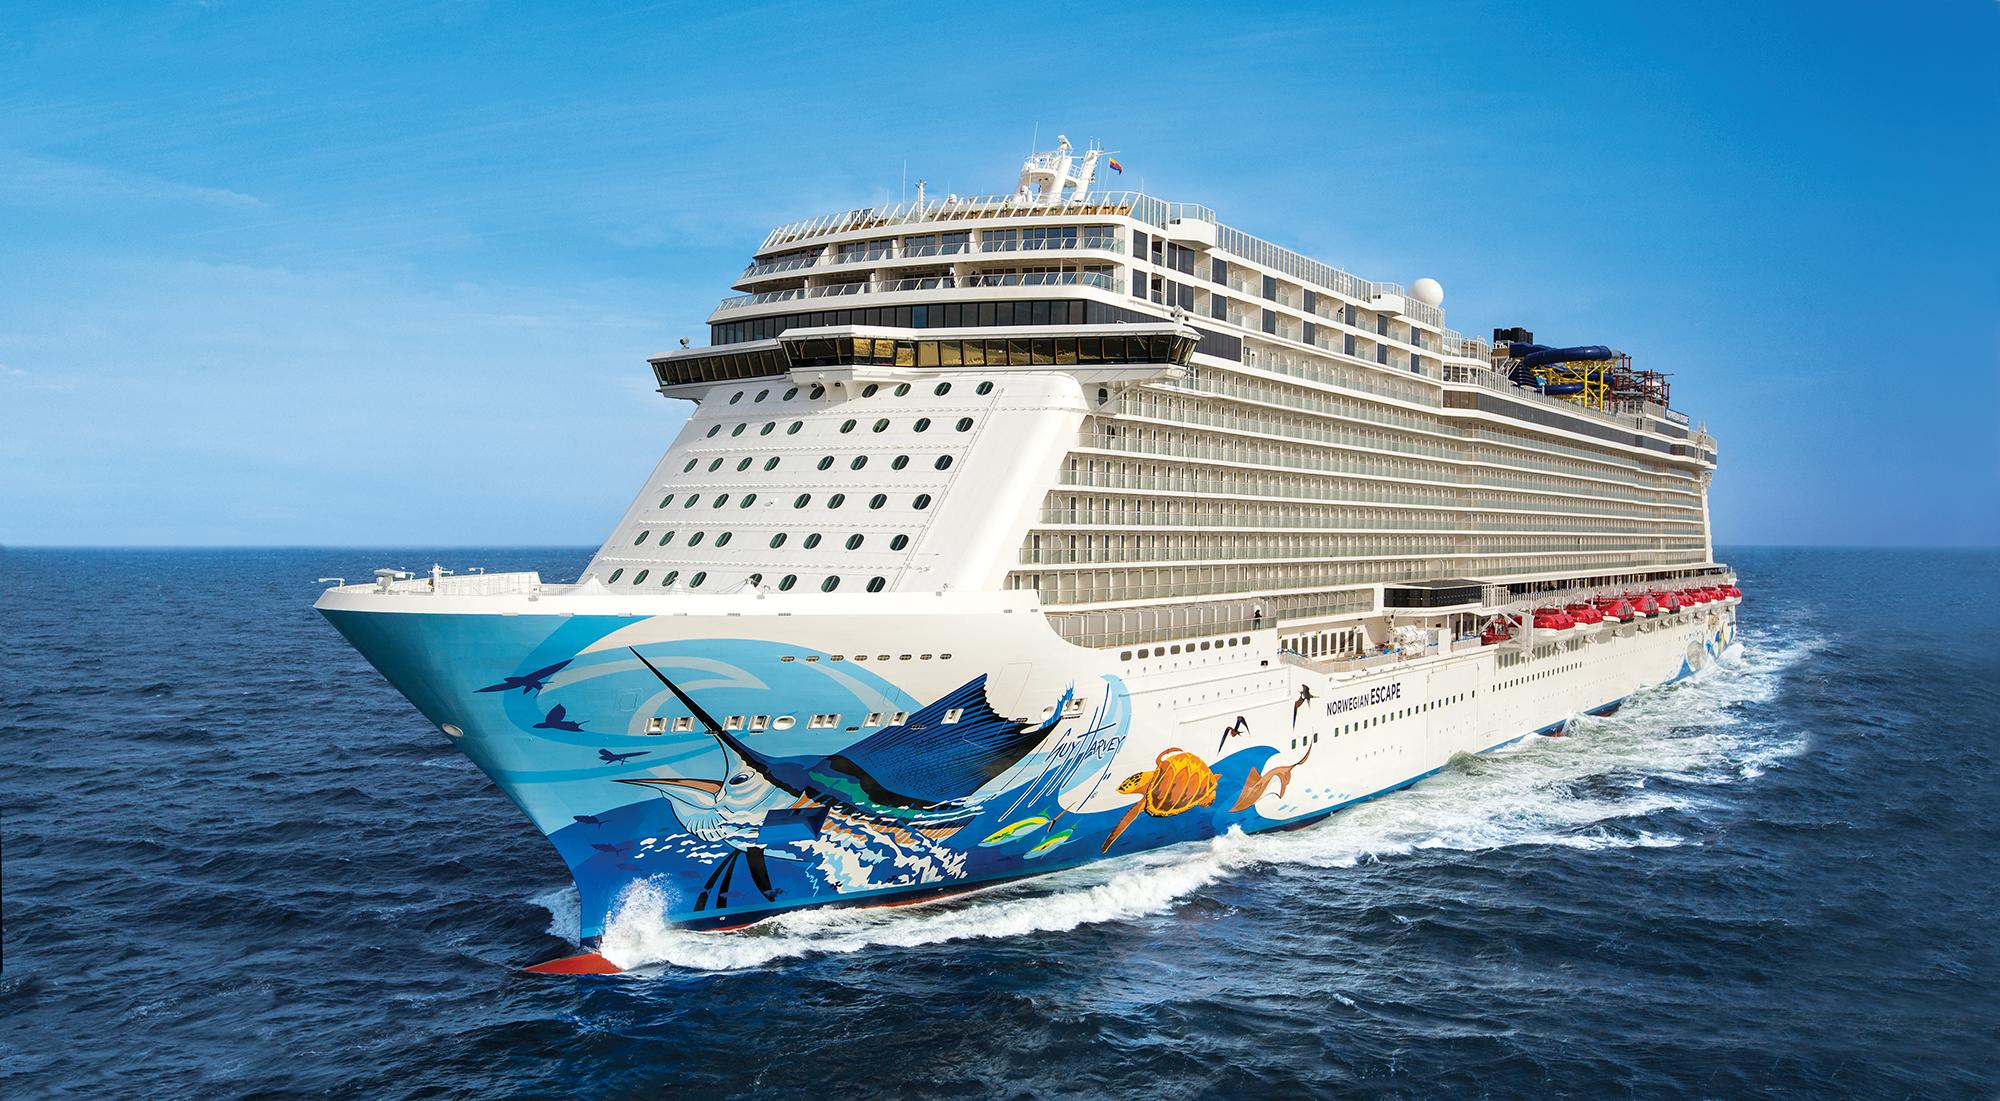 Krydstogtskibet Norwegian Escape. Foto: Norwegian Cruise Line